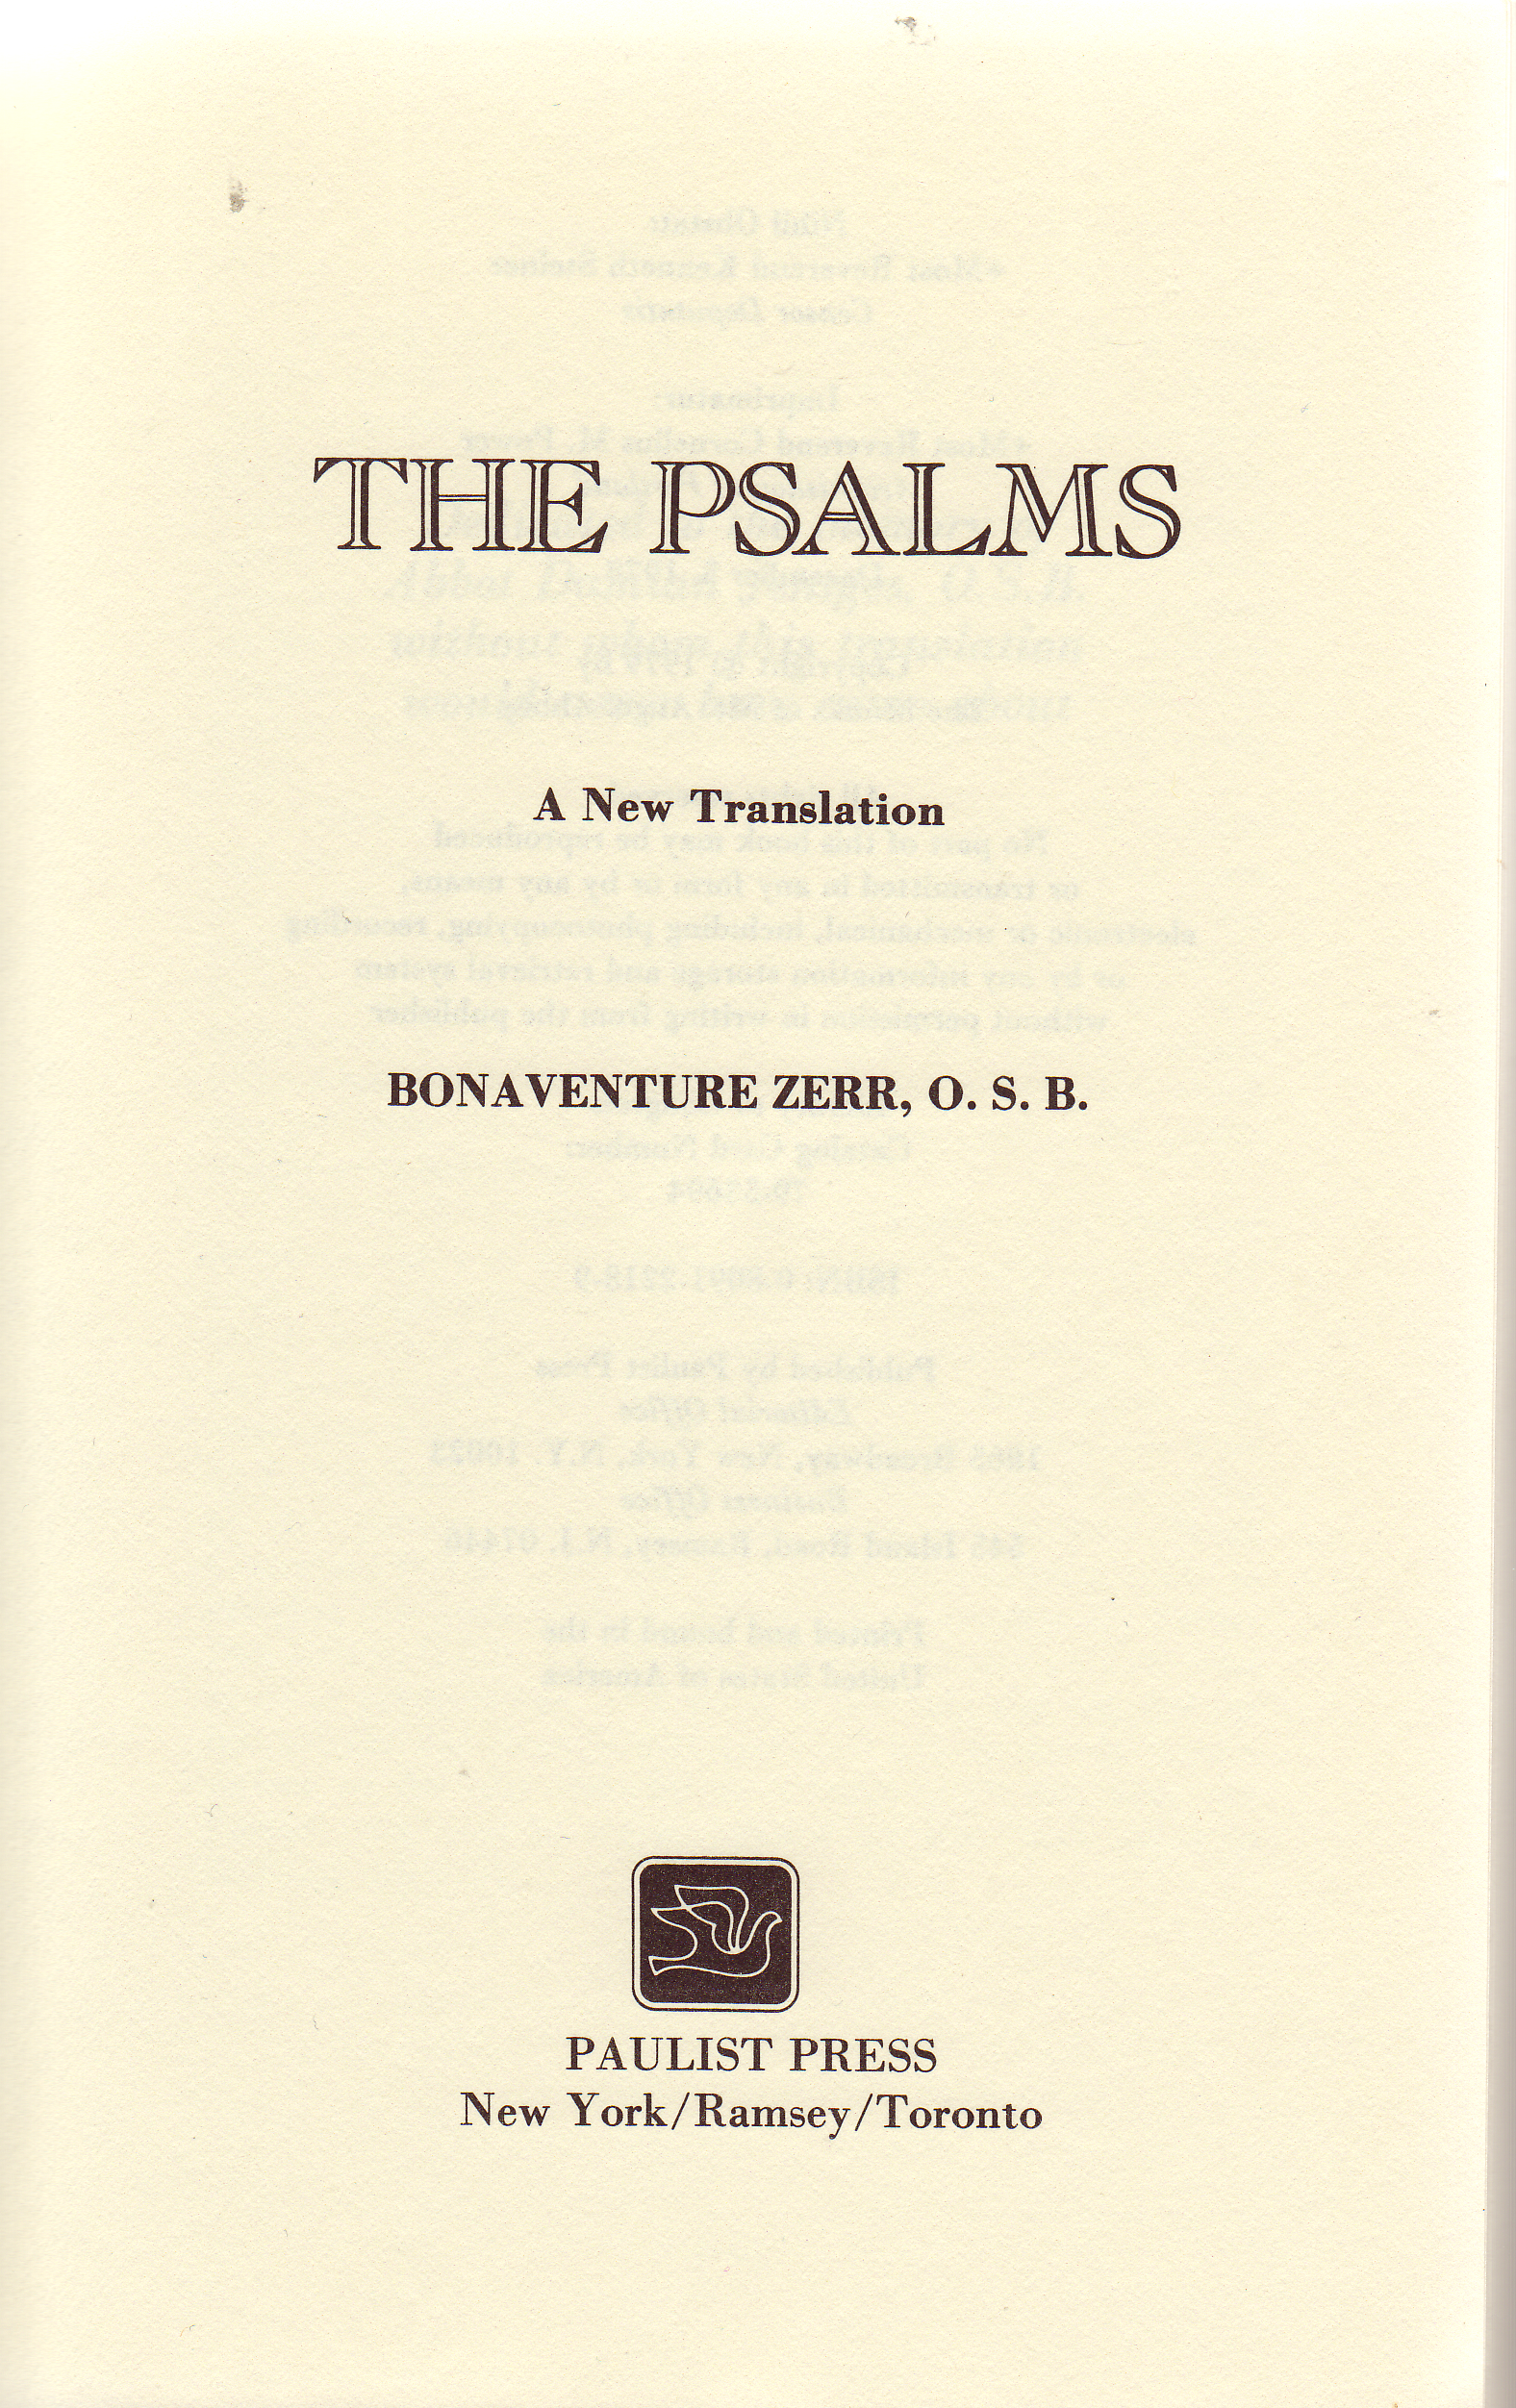 Bonaventure Zerr, O S B  - Internet Bible Catalog